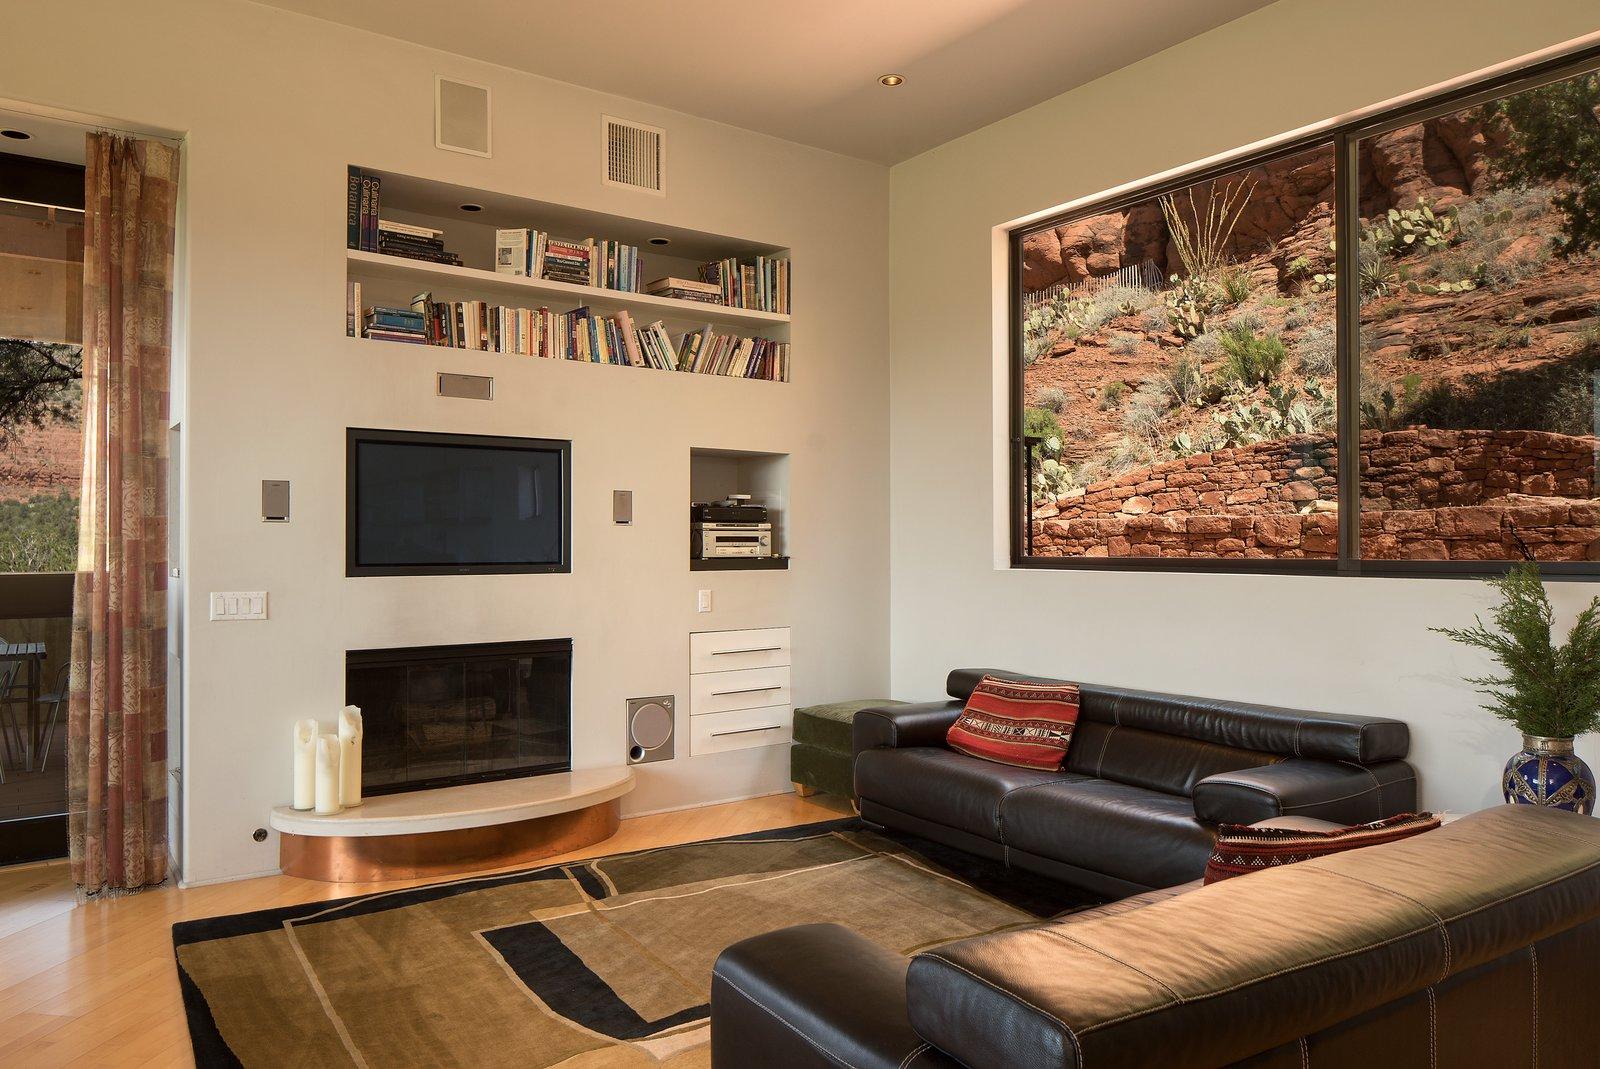 Living Room, Shelves, Sofa, Ceiling Lighting, Light Hardwood Floor, and Standard Layout Fireplace  2945 Red Rock Loop Rd.